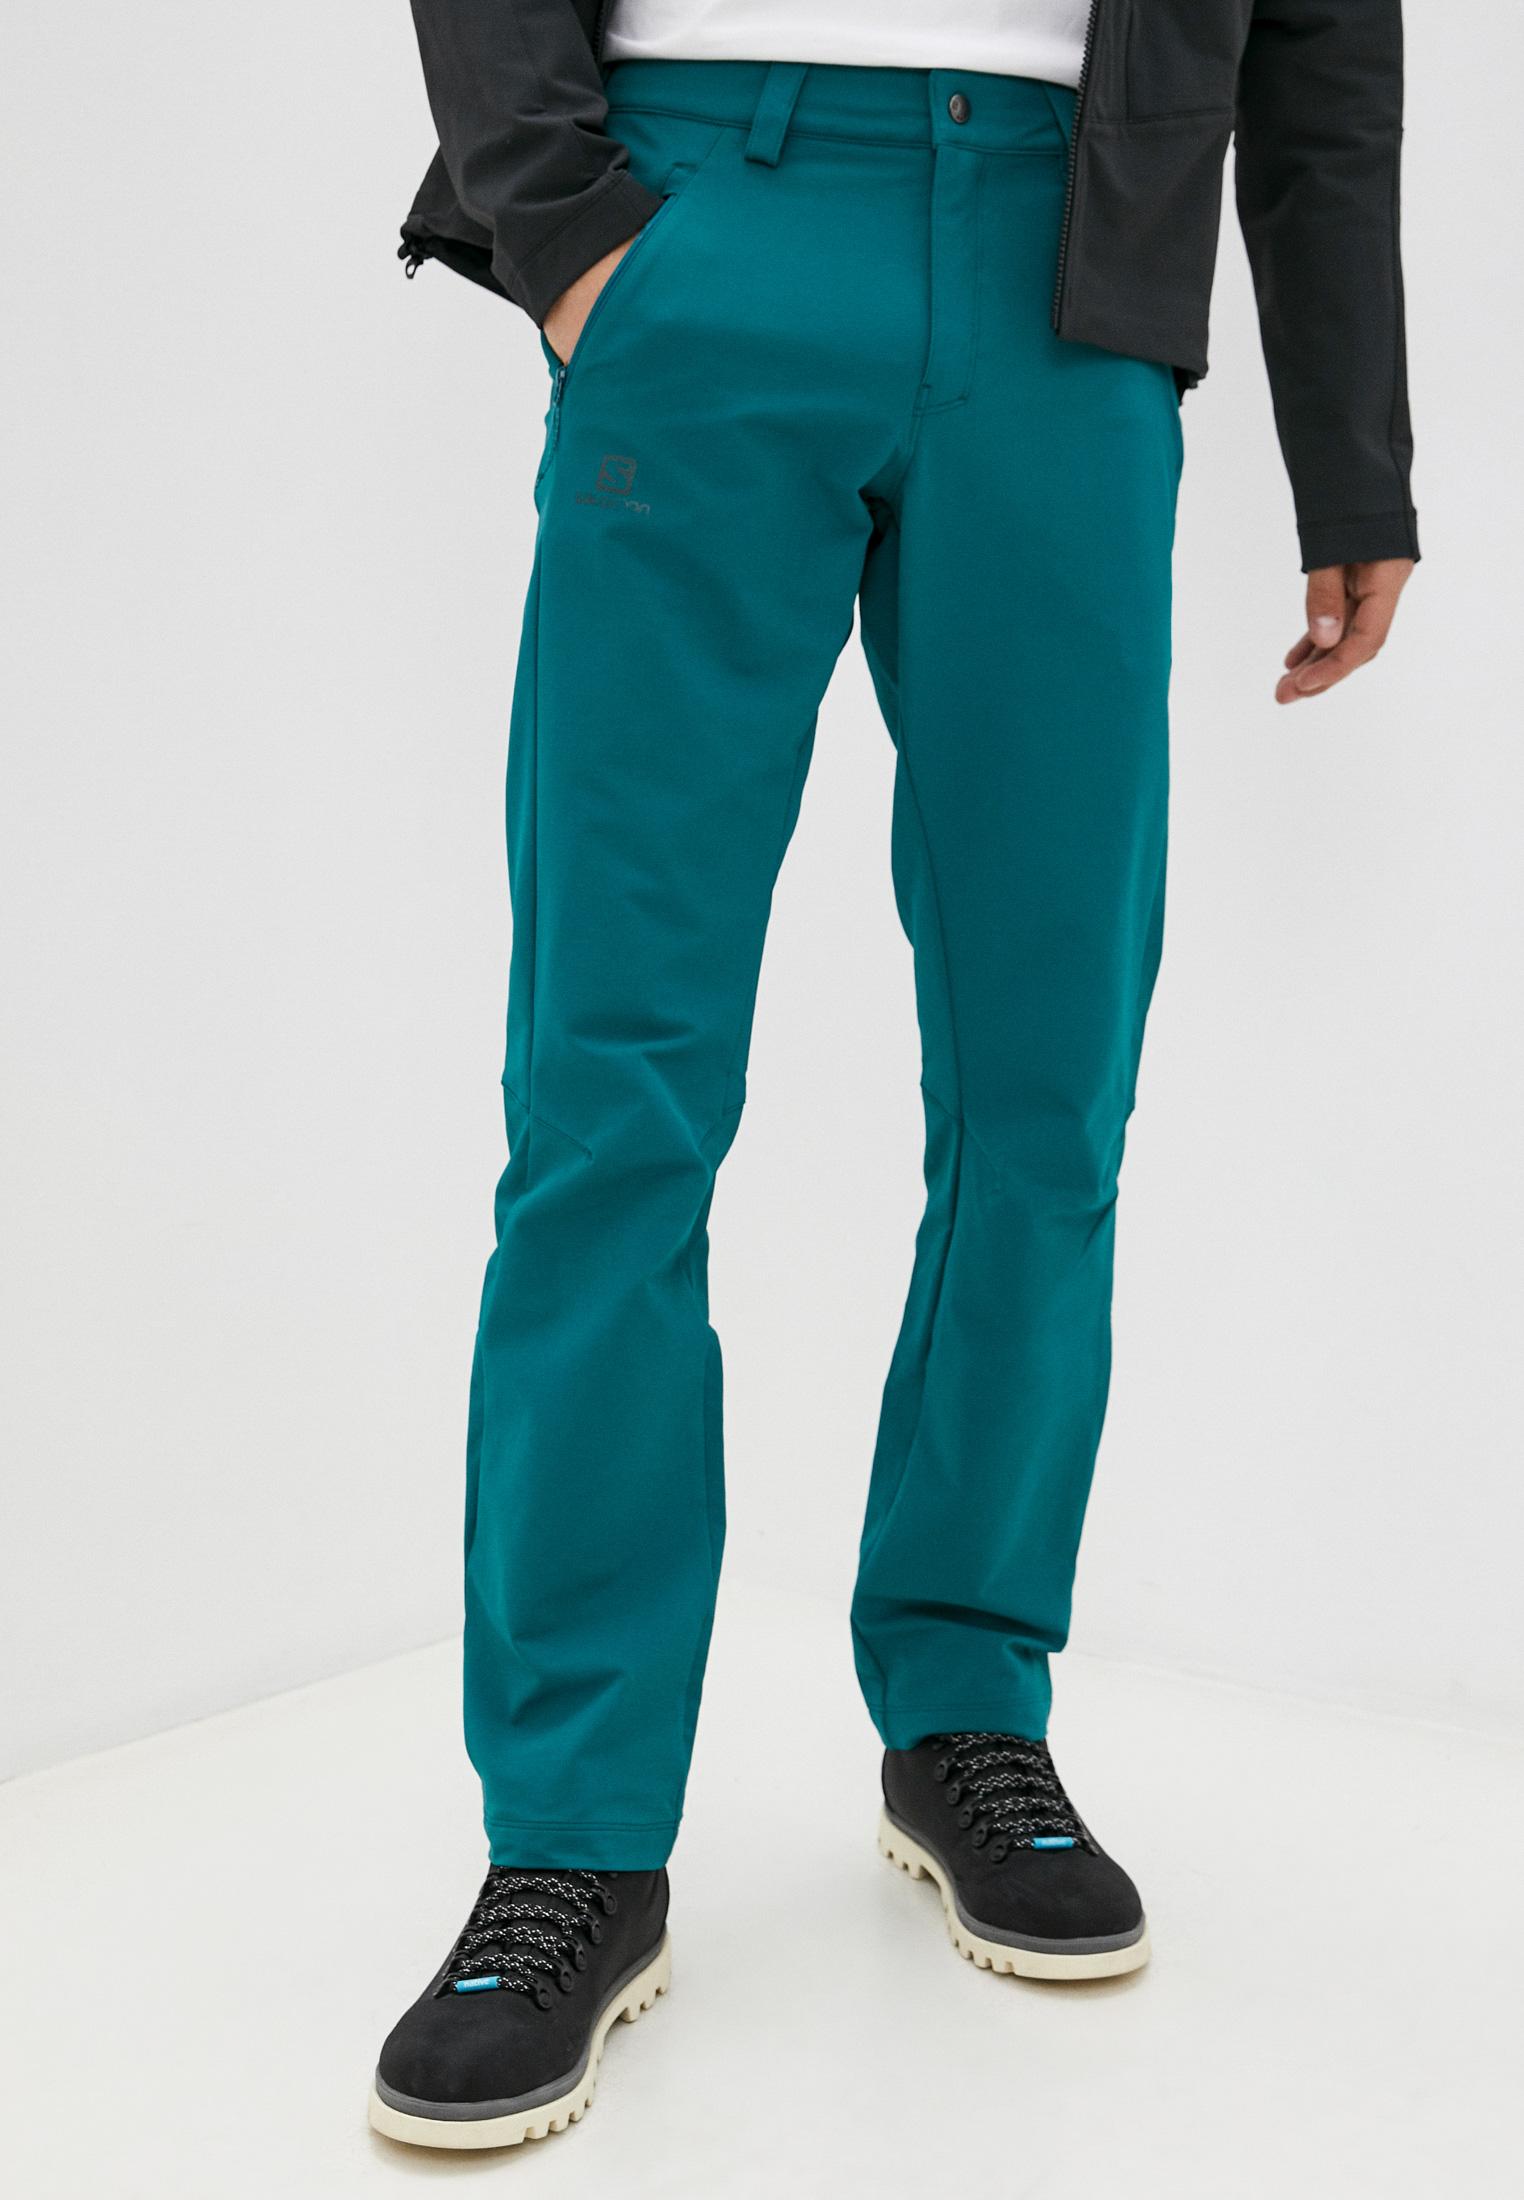 Мужские спортивные брюки SALOMON (Саломон) Брюки Salomon